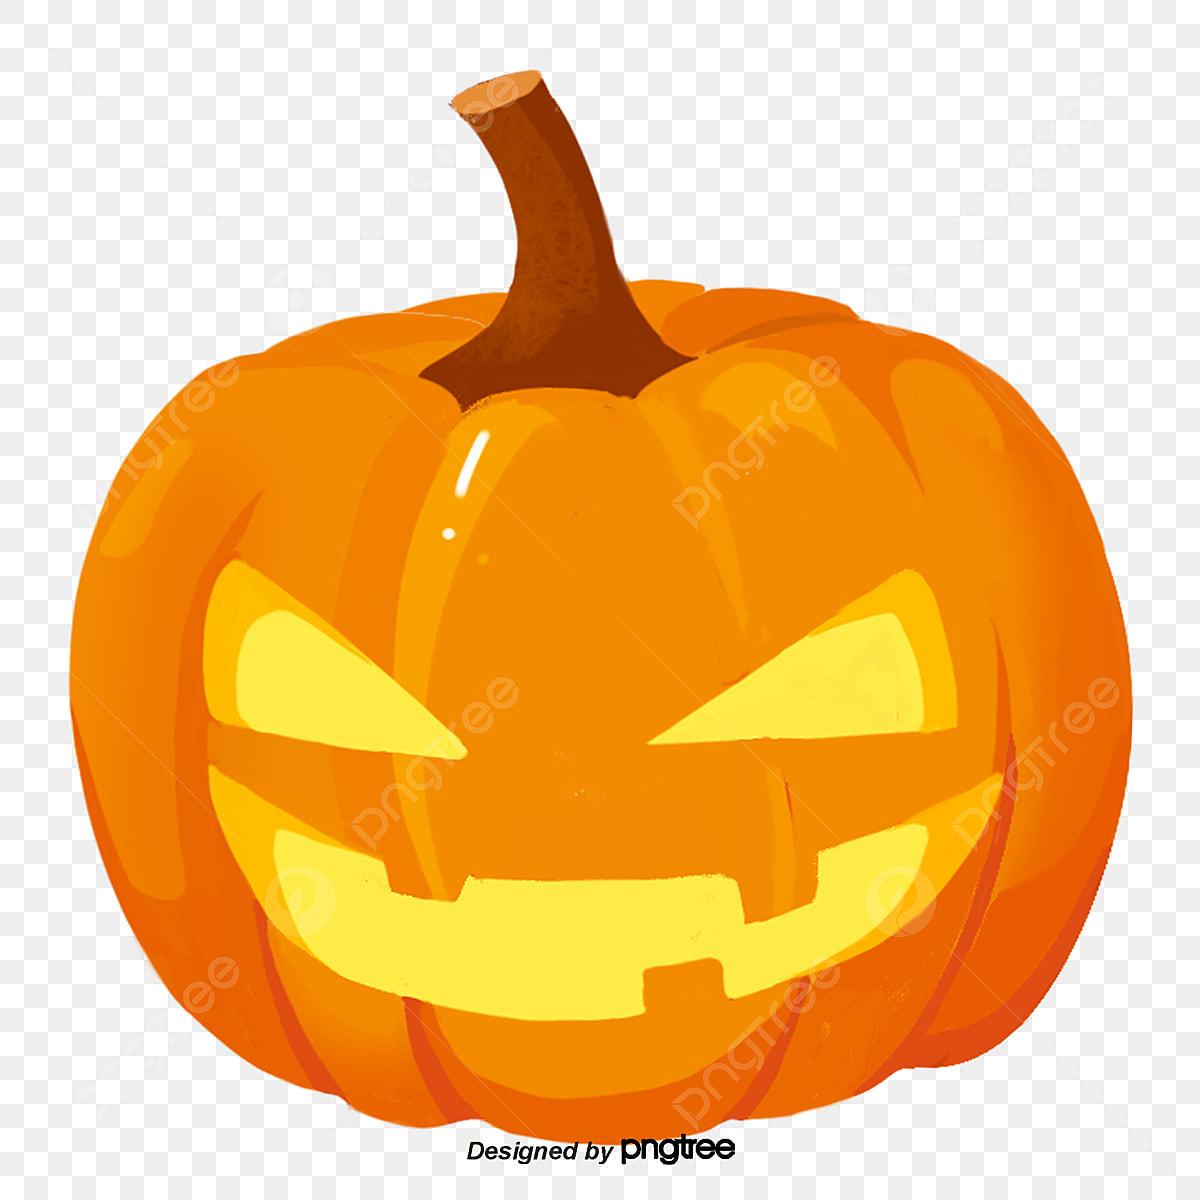 Halloween Pumpkin Png Clipart.Yellow Halloween Pumpkin Halloween Pumpkin Cartoon Png